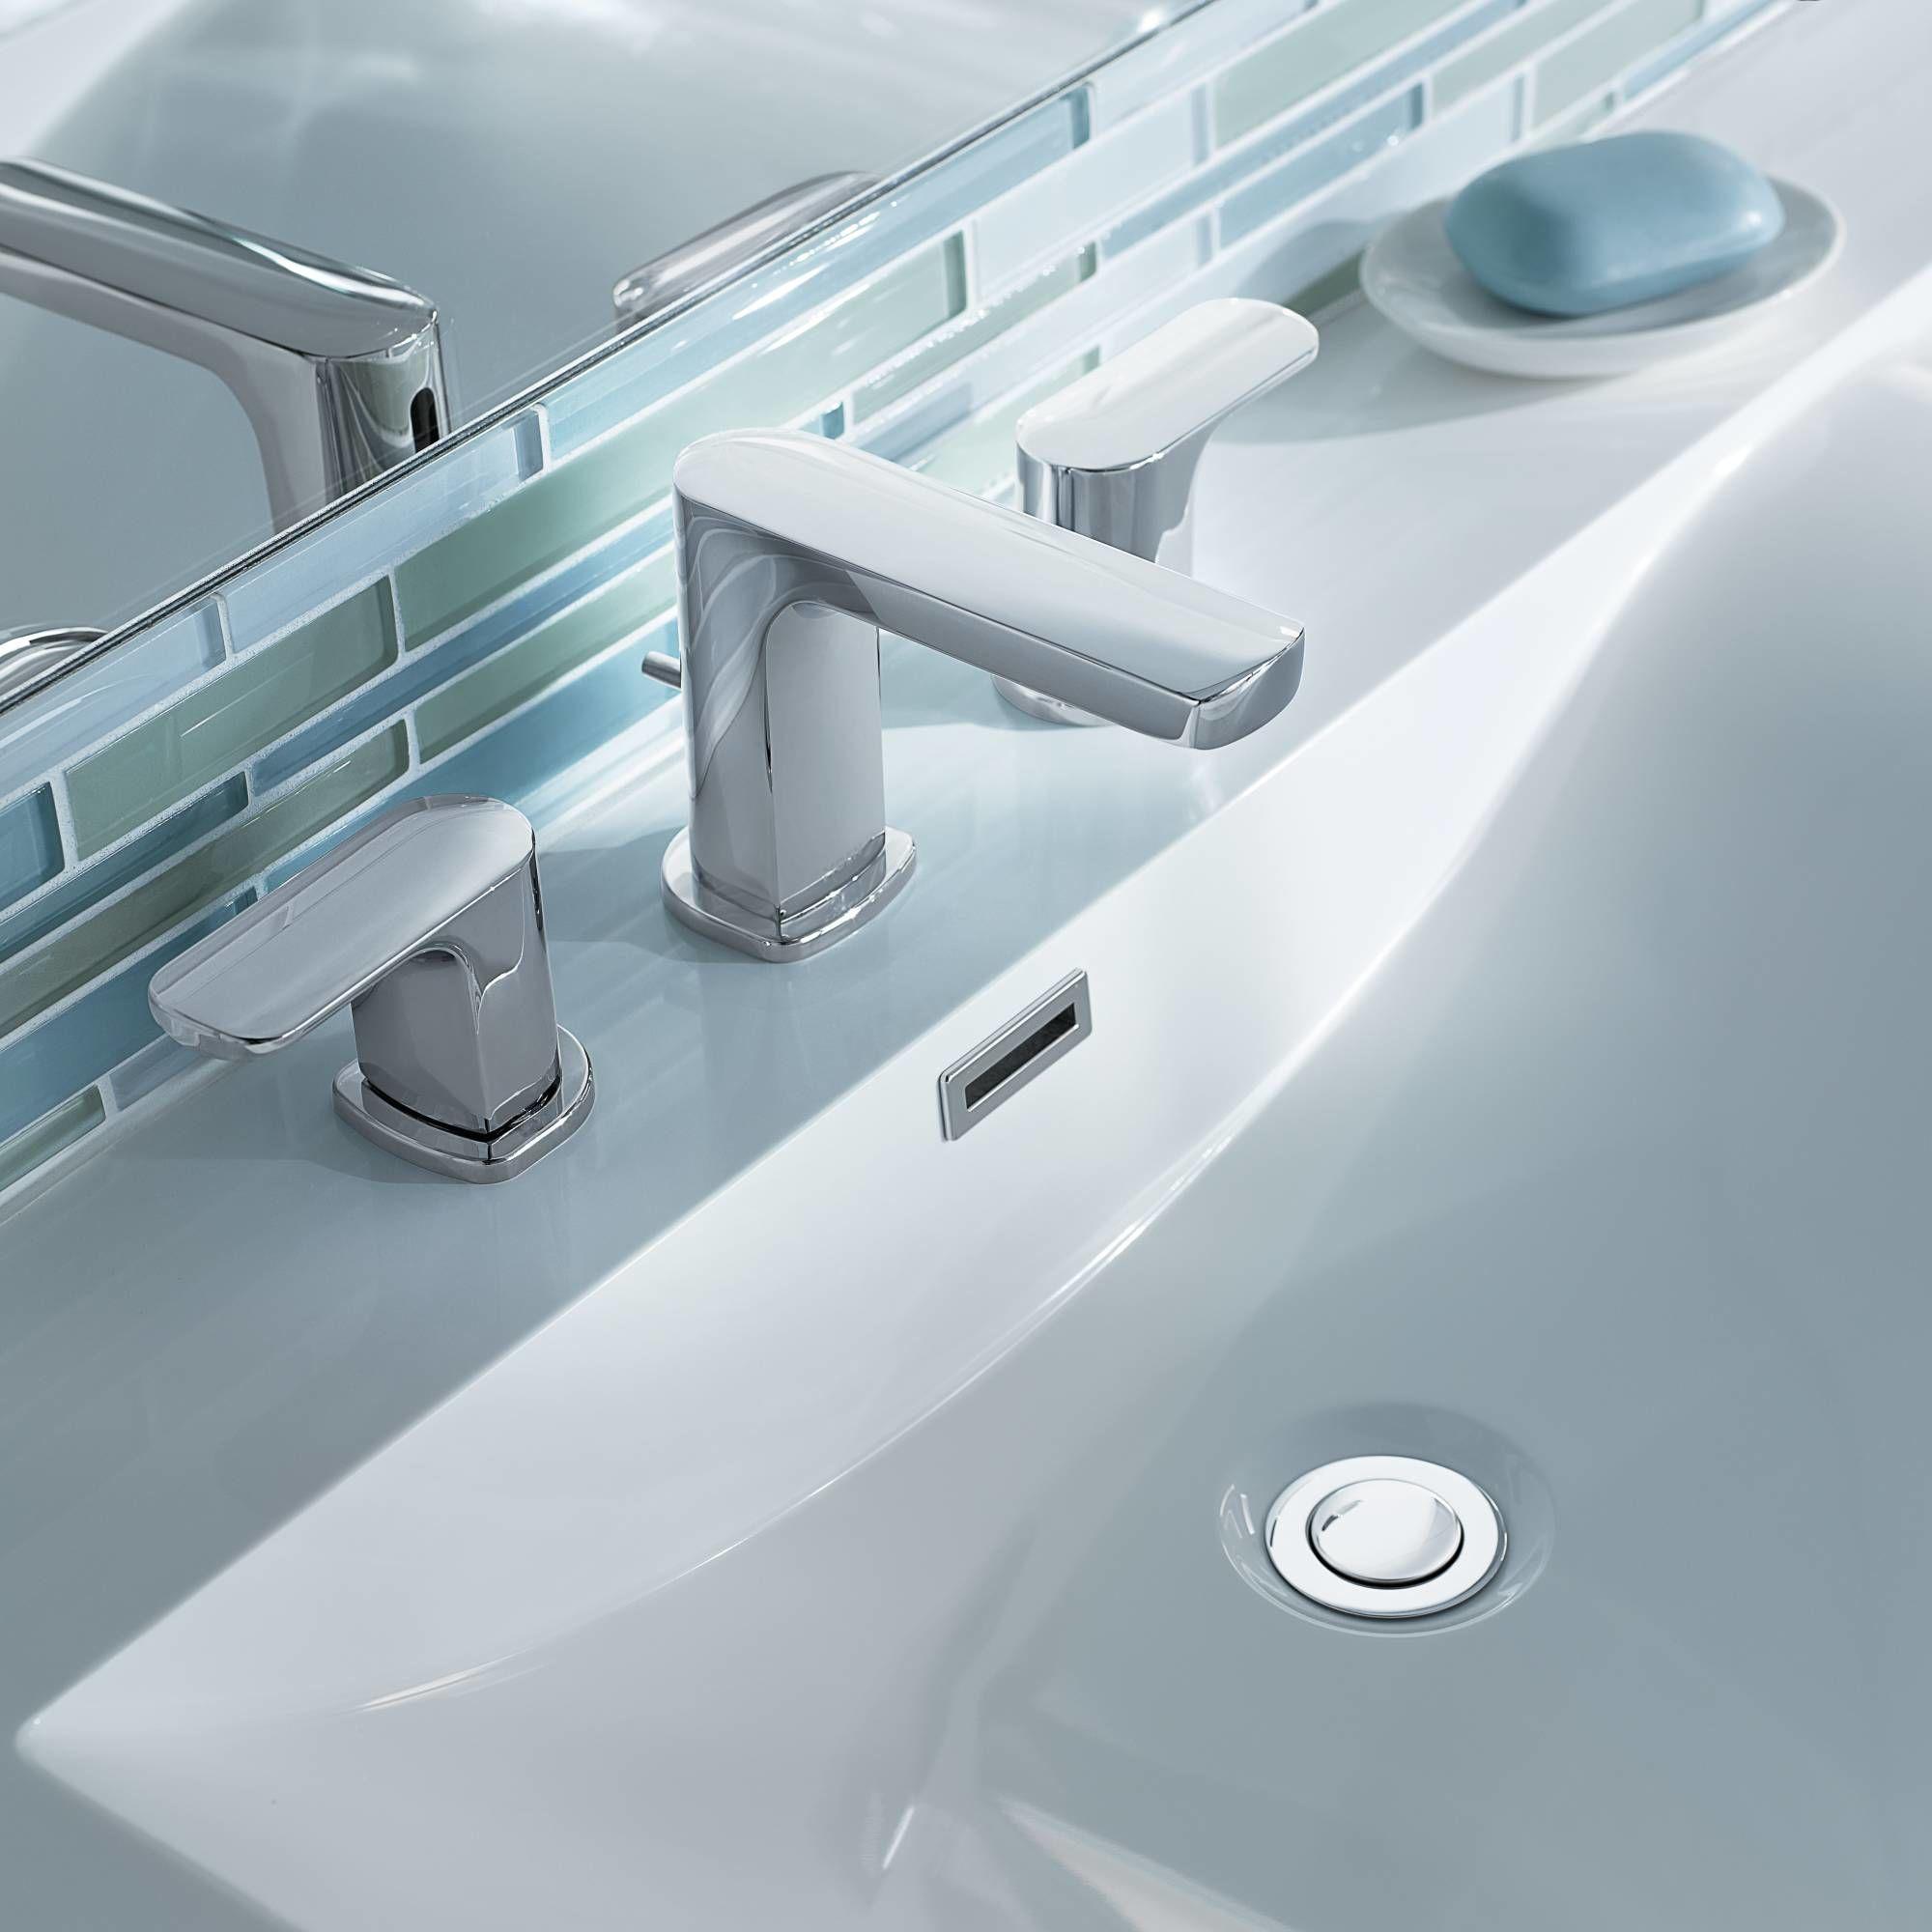 Moen T6920 Chrome Rizon Double-Handle Widespread Low Arc Bathroom ...